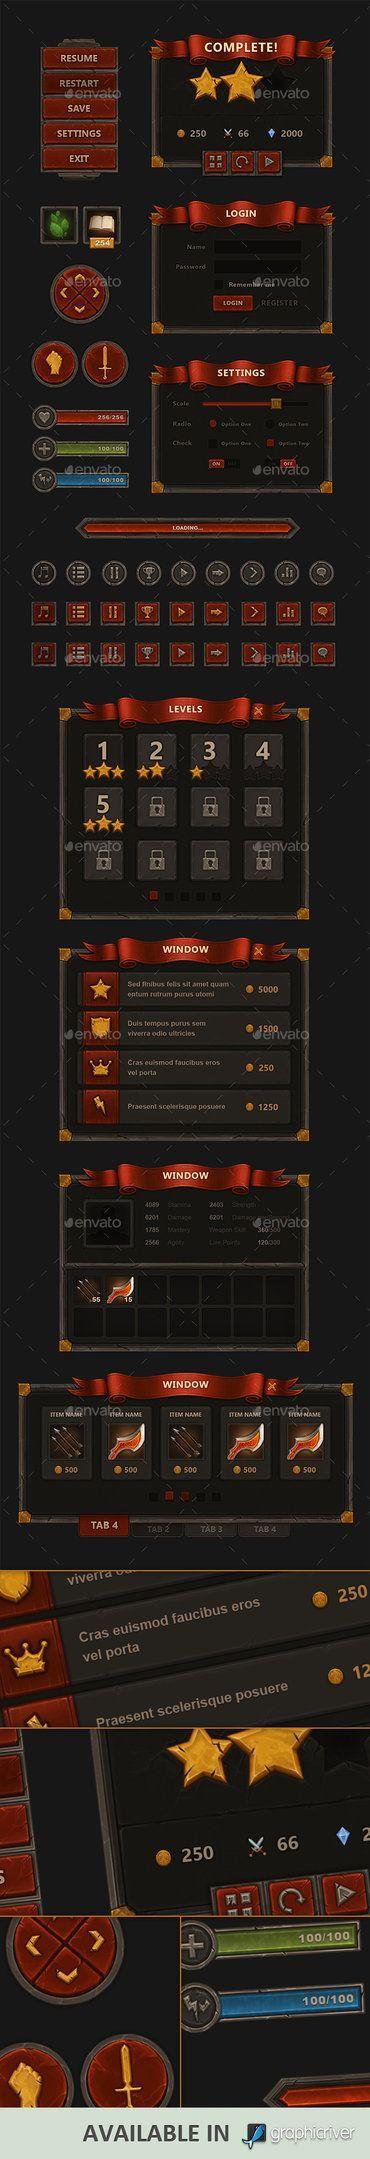 Fantasy Mobile Game Interface - http://graphicriver.net/item/fantasy-mobile-game-interface/9009432?WT.ac=portfolio&WT.z_author=KEvil: